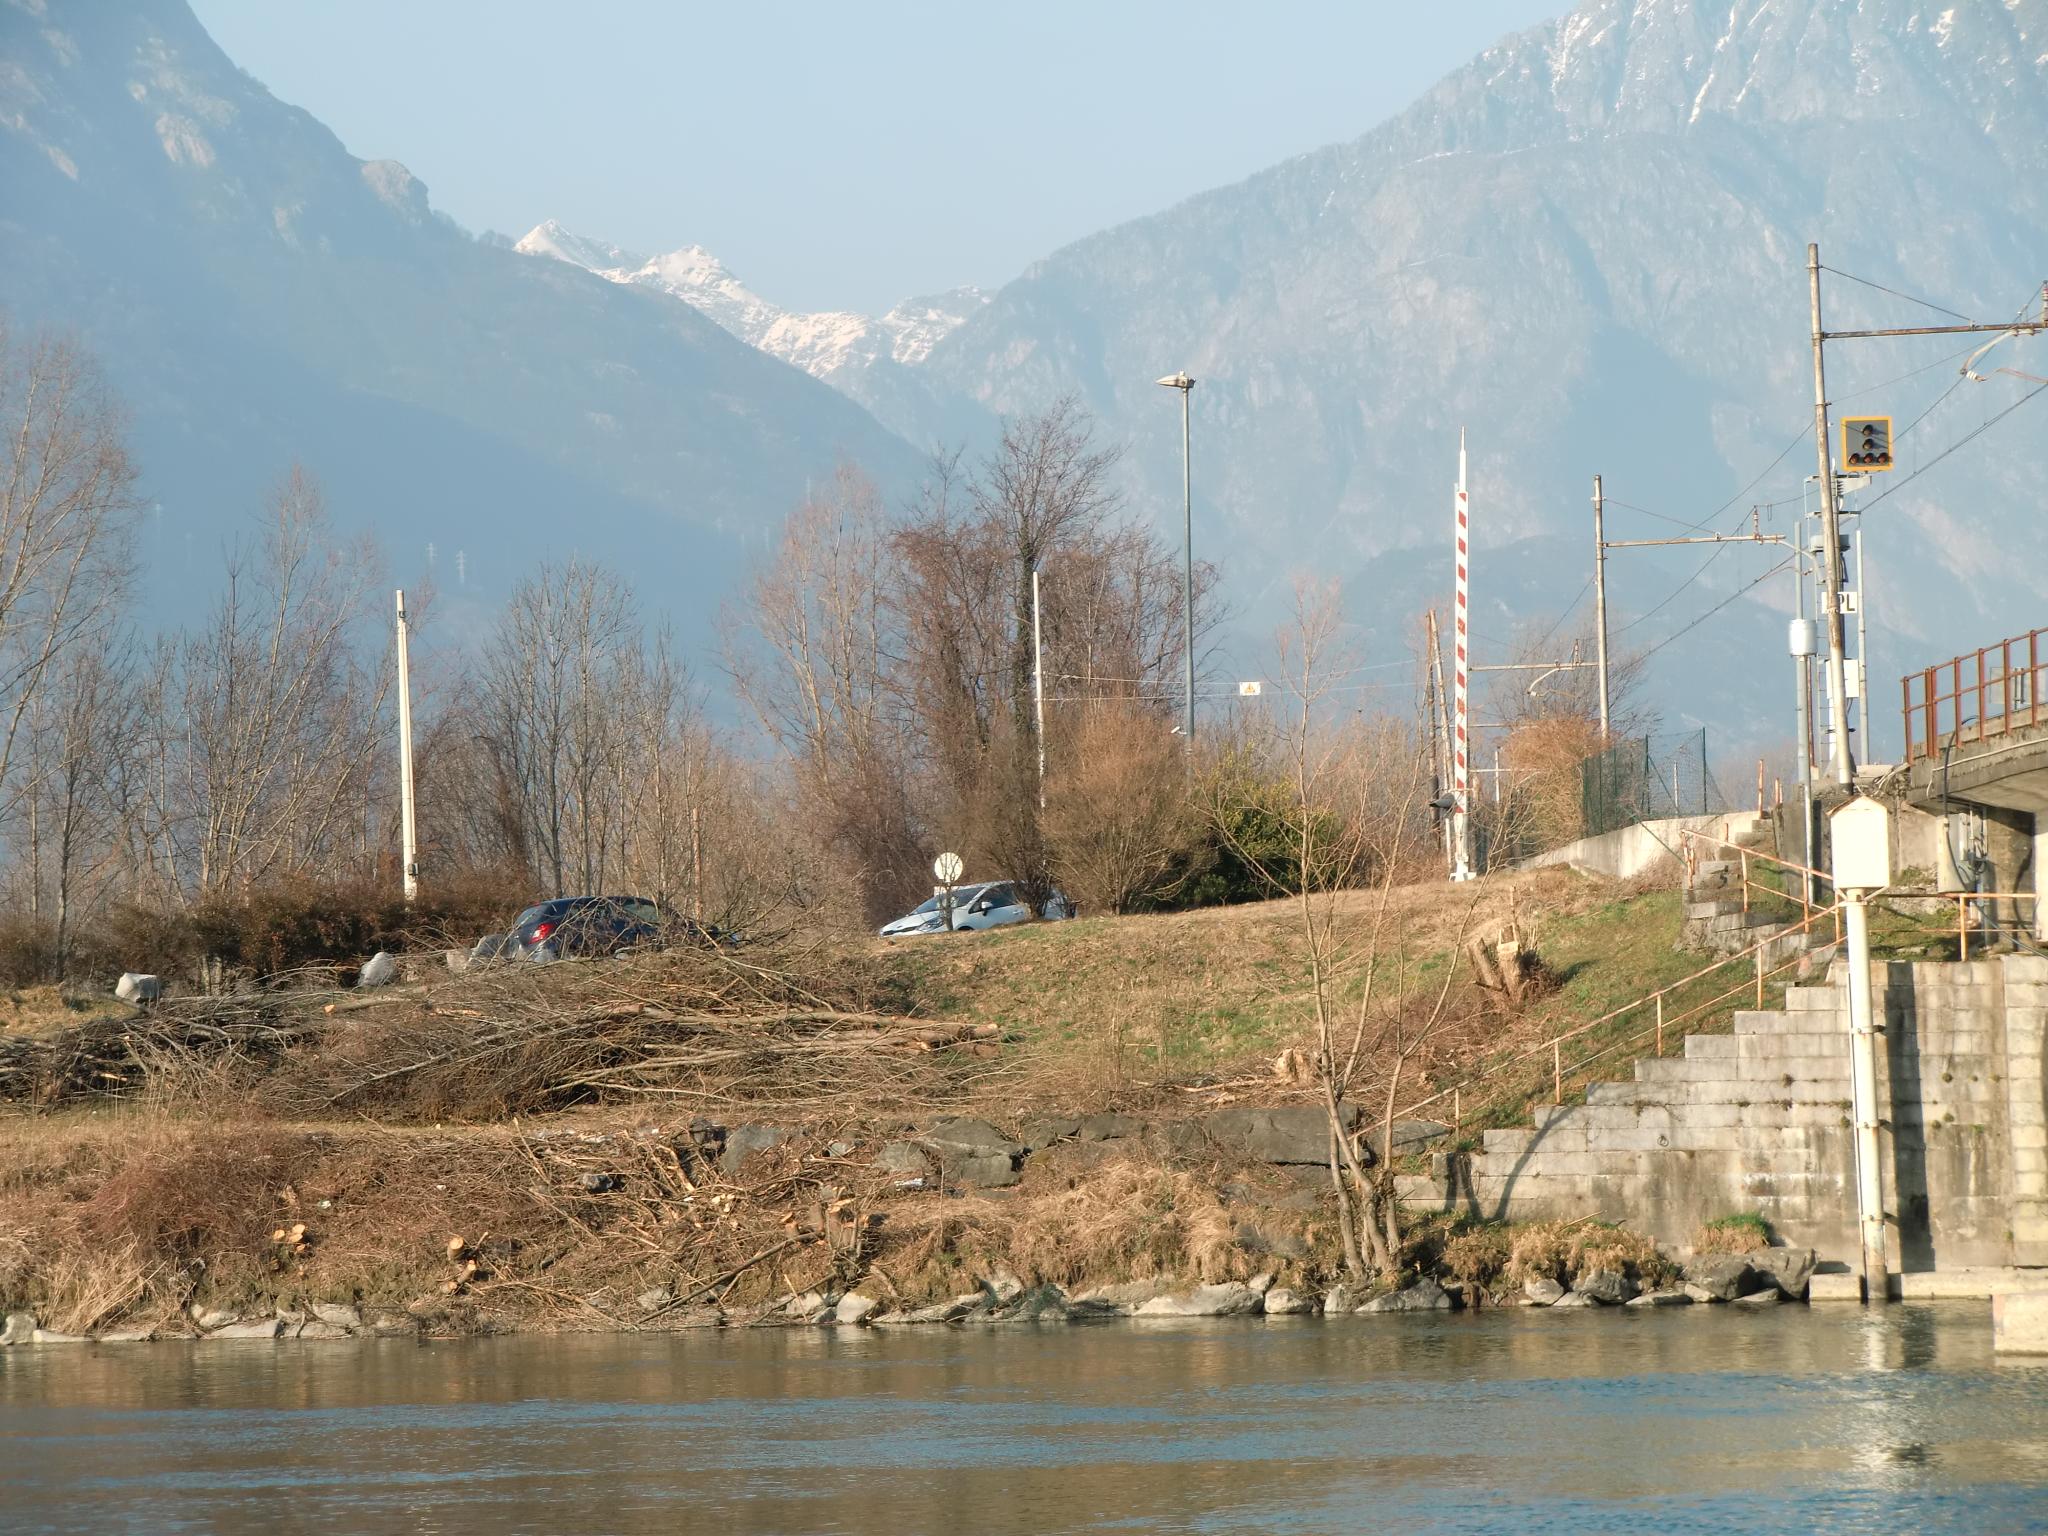 Valtellina, Valchiavenna, Orobie e Lario: MARZO 2017-cimg7179.jpg